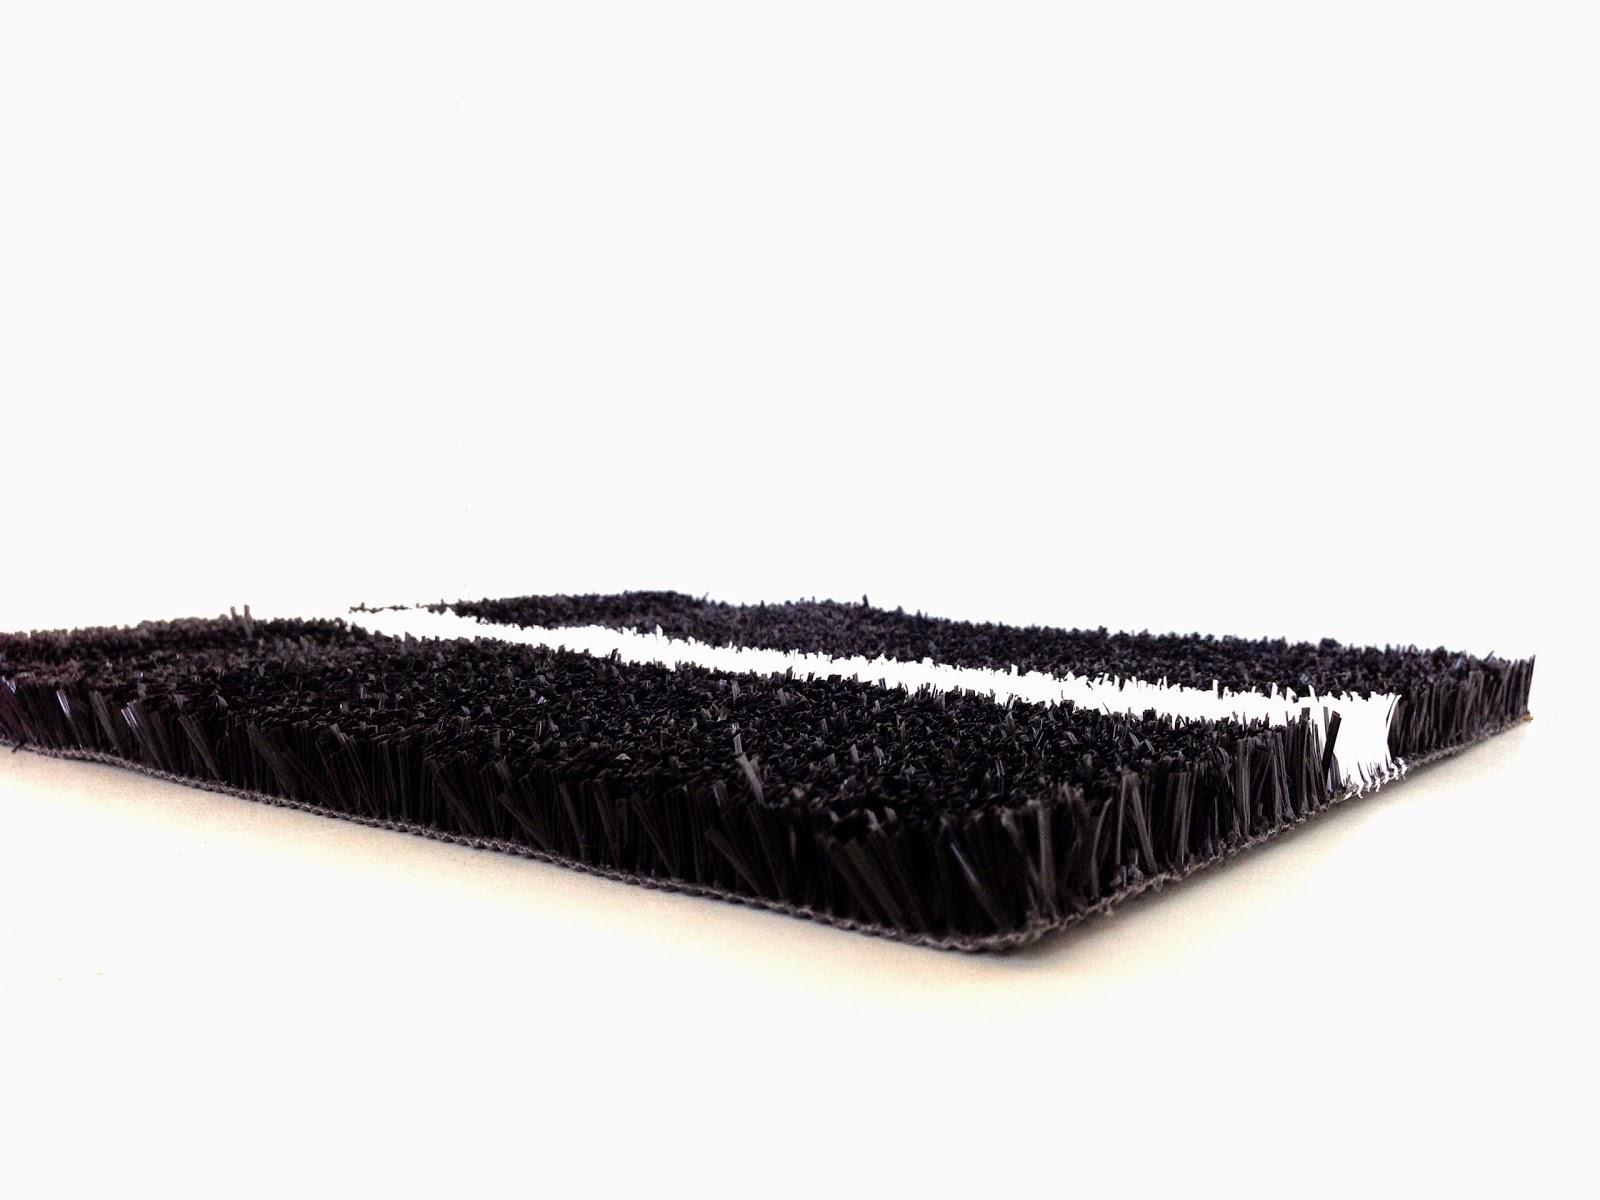 césped artificial de padel color negro